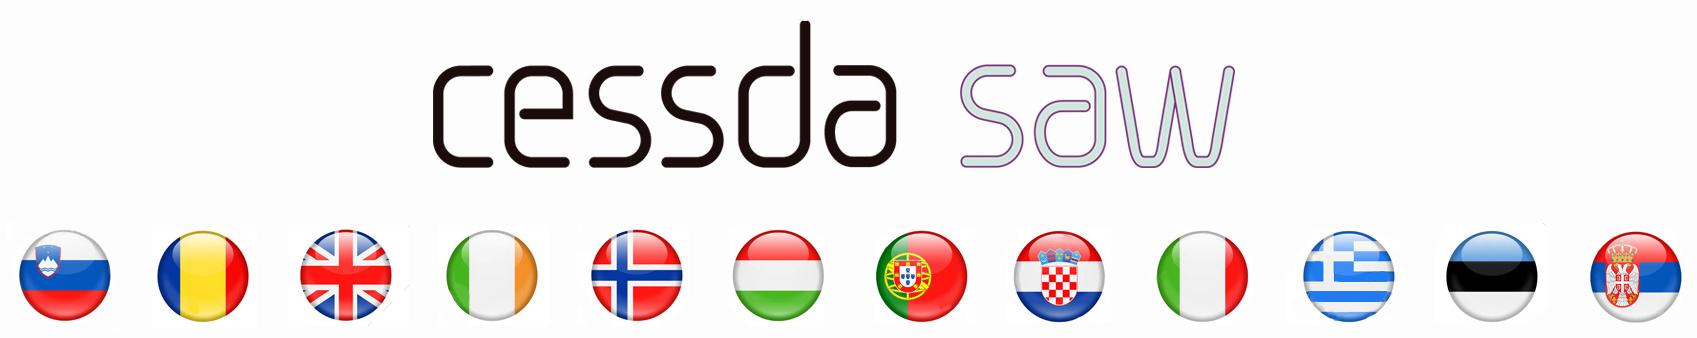 cessda saw countries